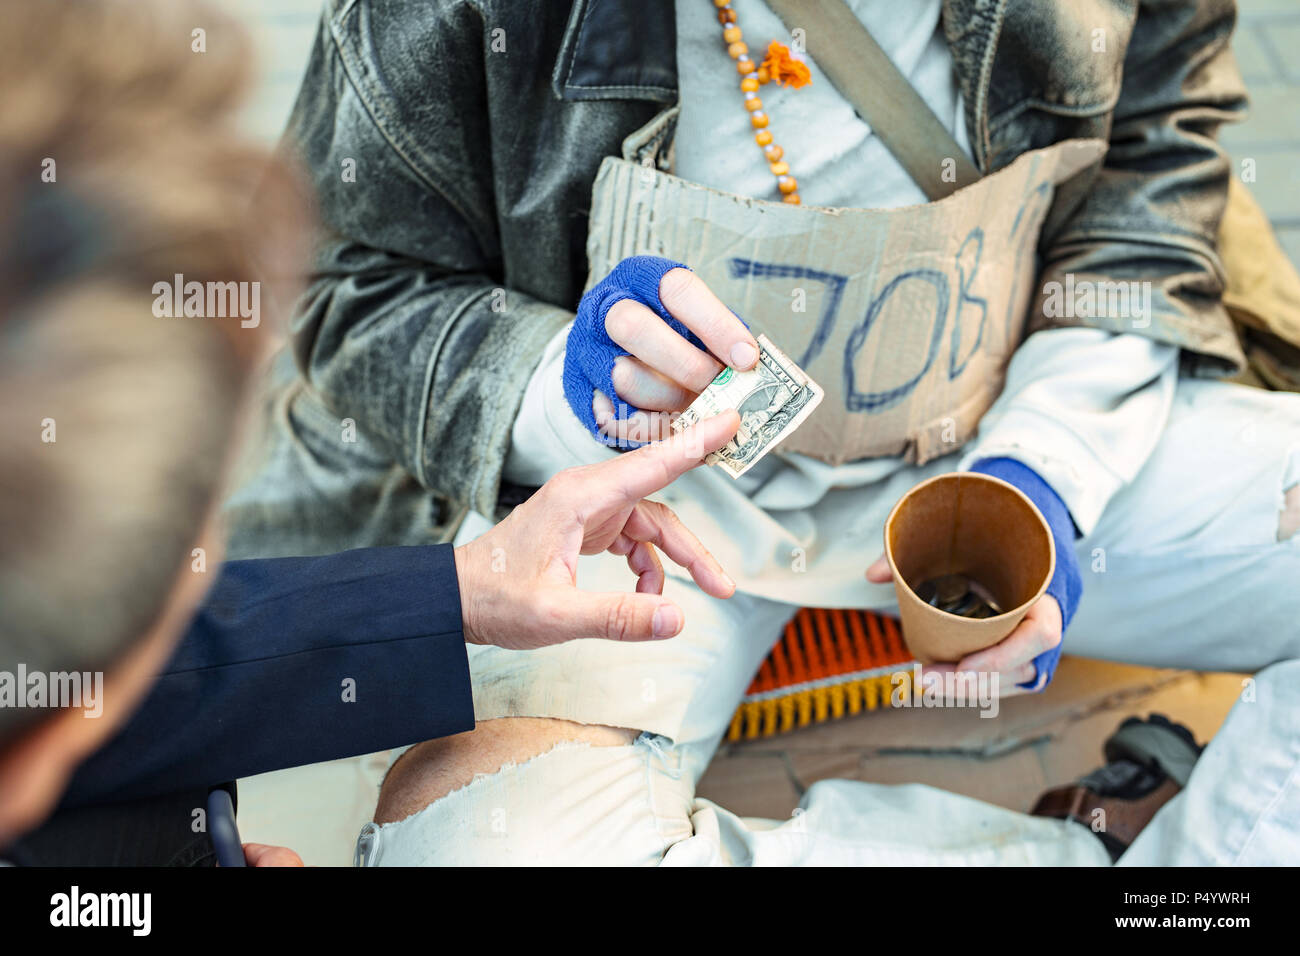 Homeless man wearing tattered trousers asking for money - Stock Image